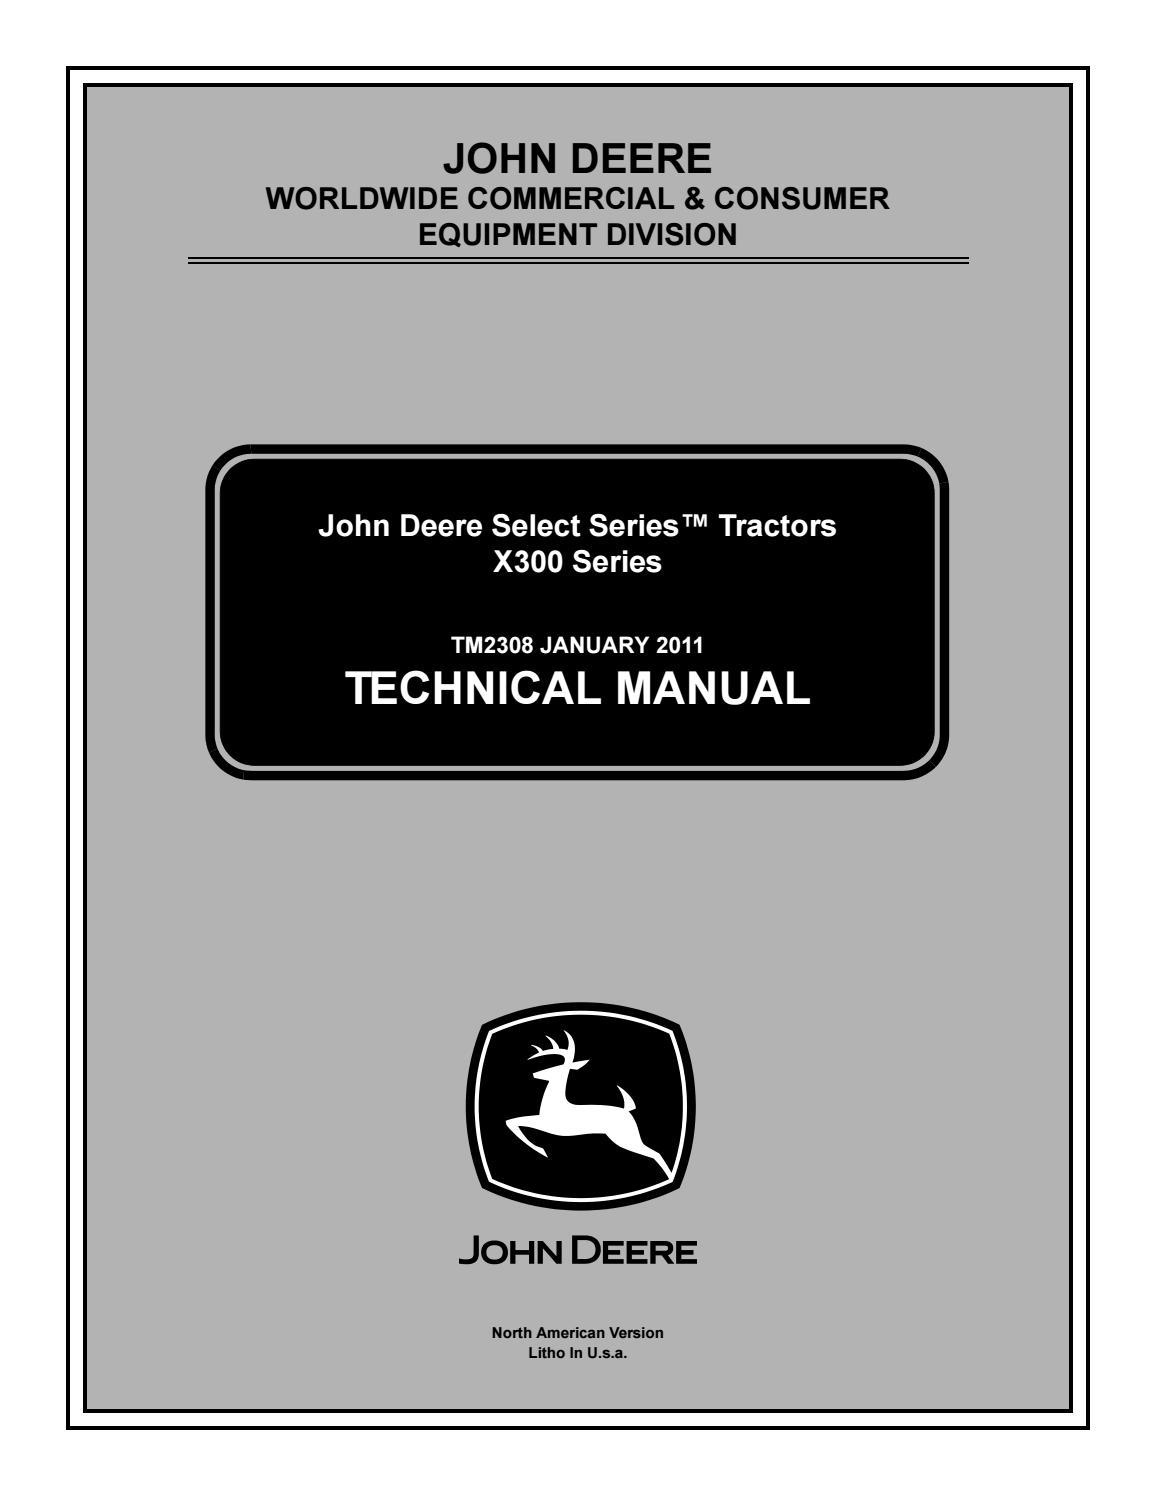 JOHN DEERE X304 LAWN TRACTOR Service Repair Manual by 163114103 - issuu | X324 Wiring Diagram |  | Issuu